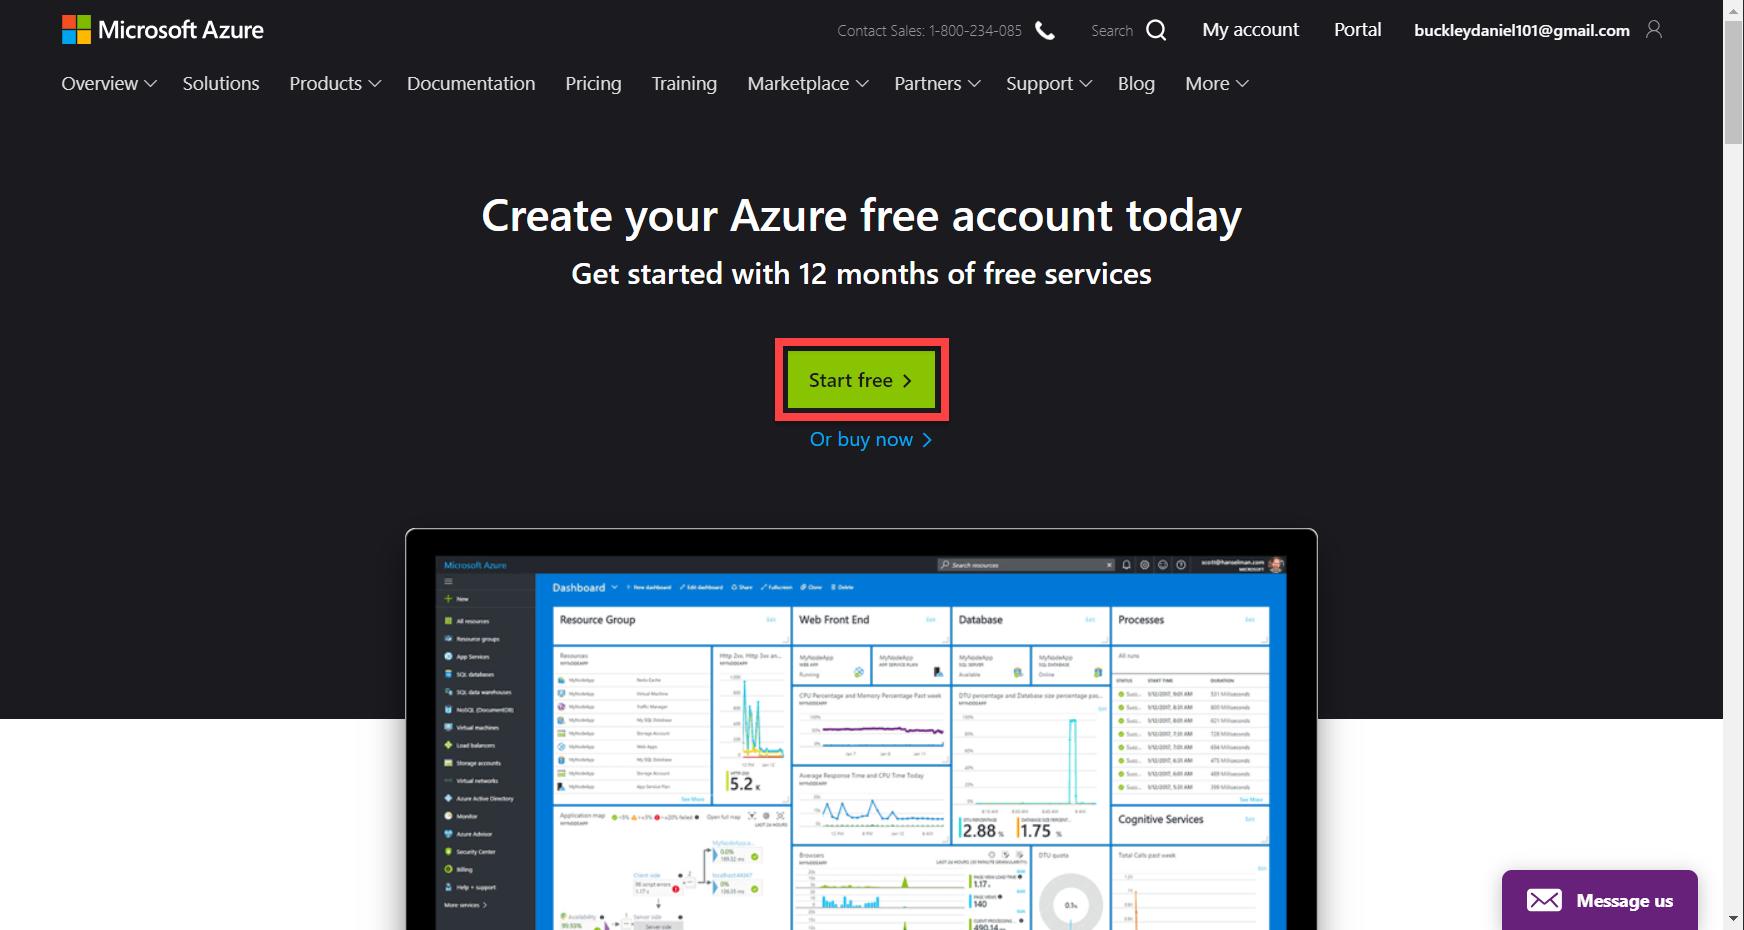 Microsoft Azure homepage